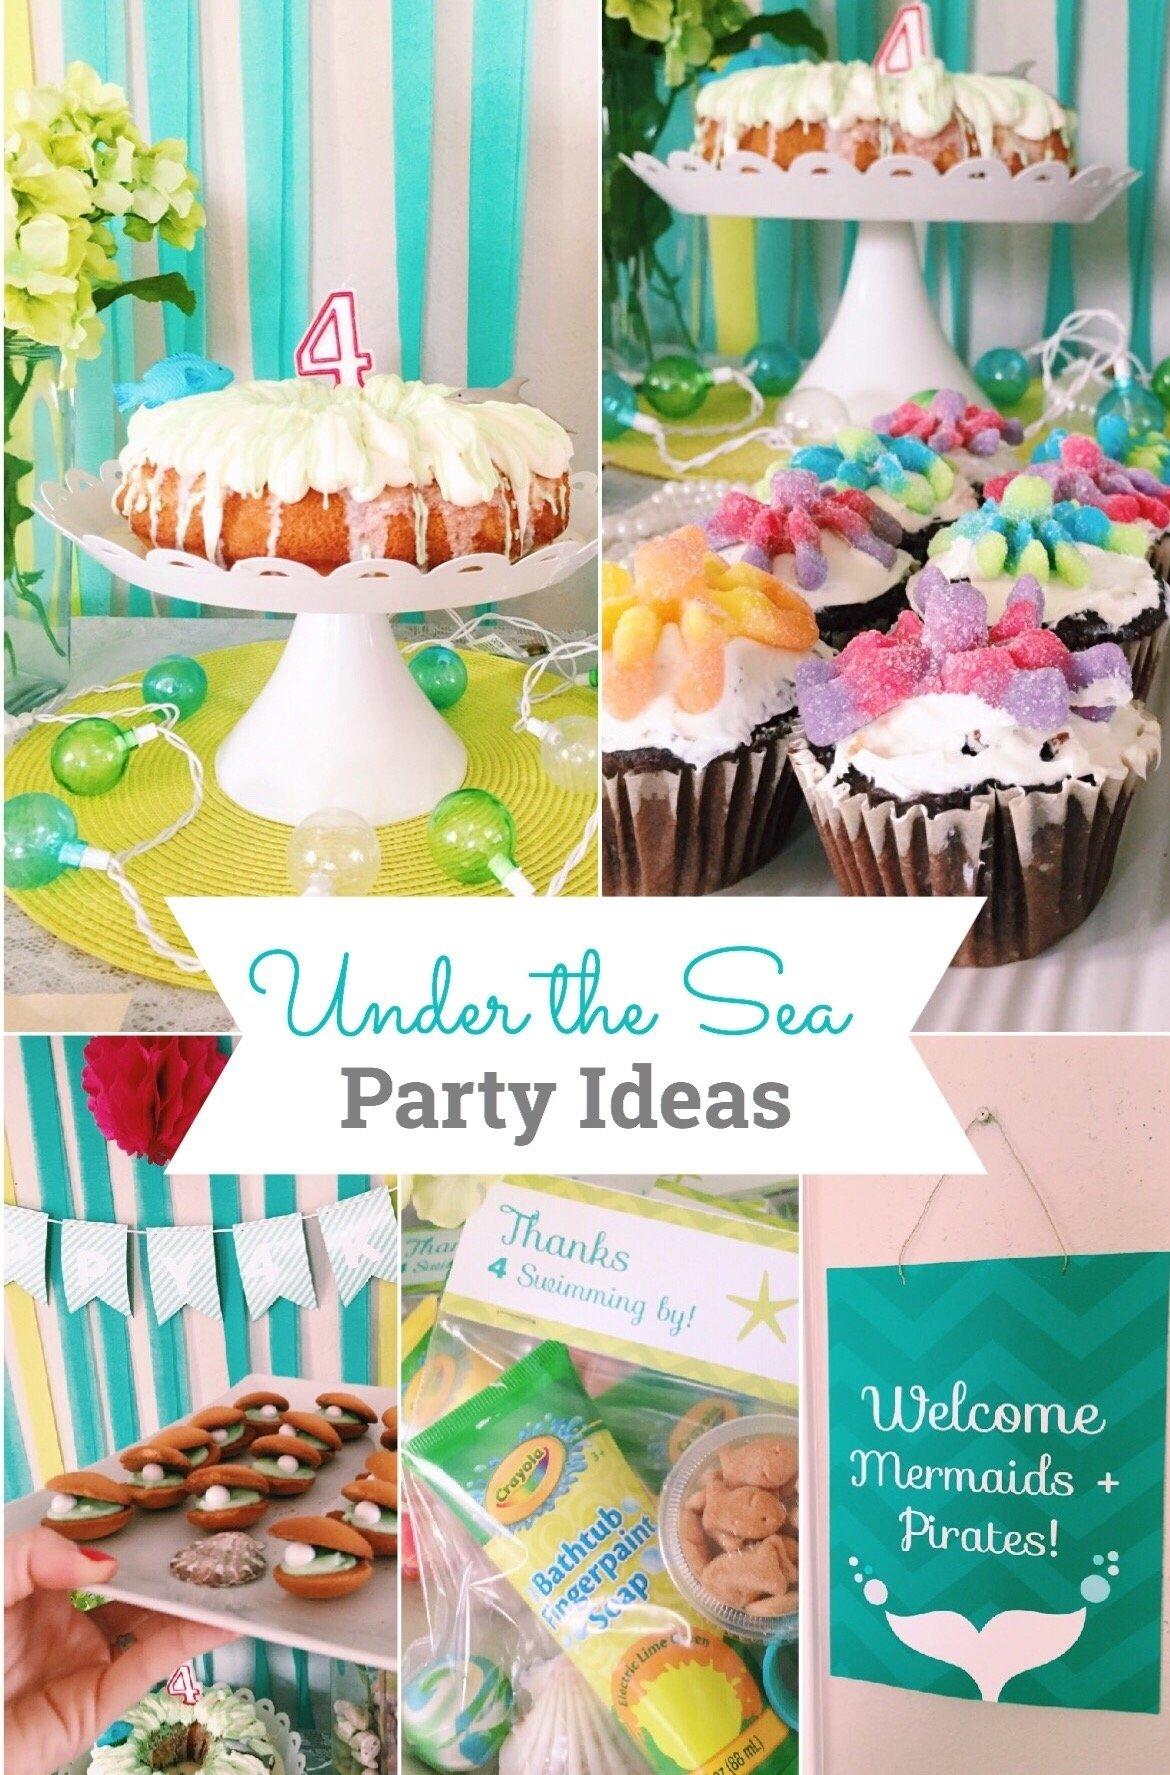 10 Attractive Under The Sea Party Ideas under the sea party ideas brigeeski 1 2020